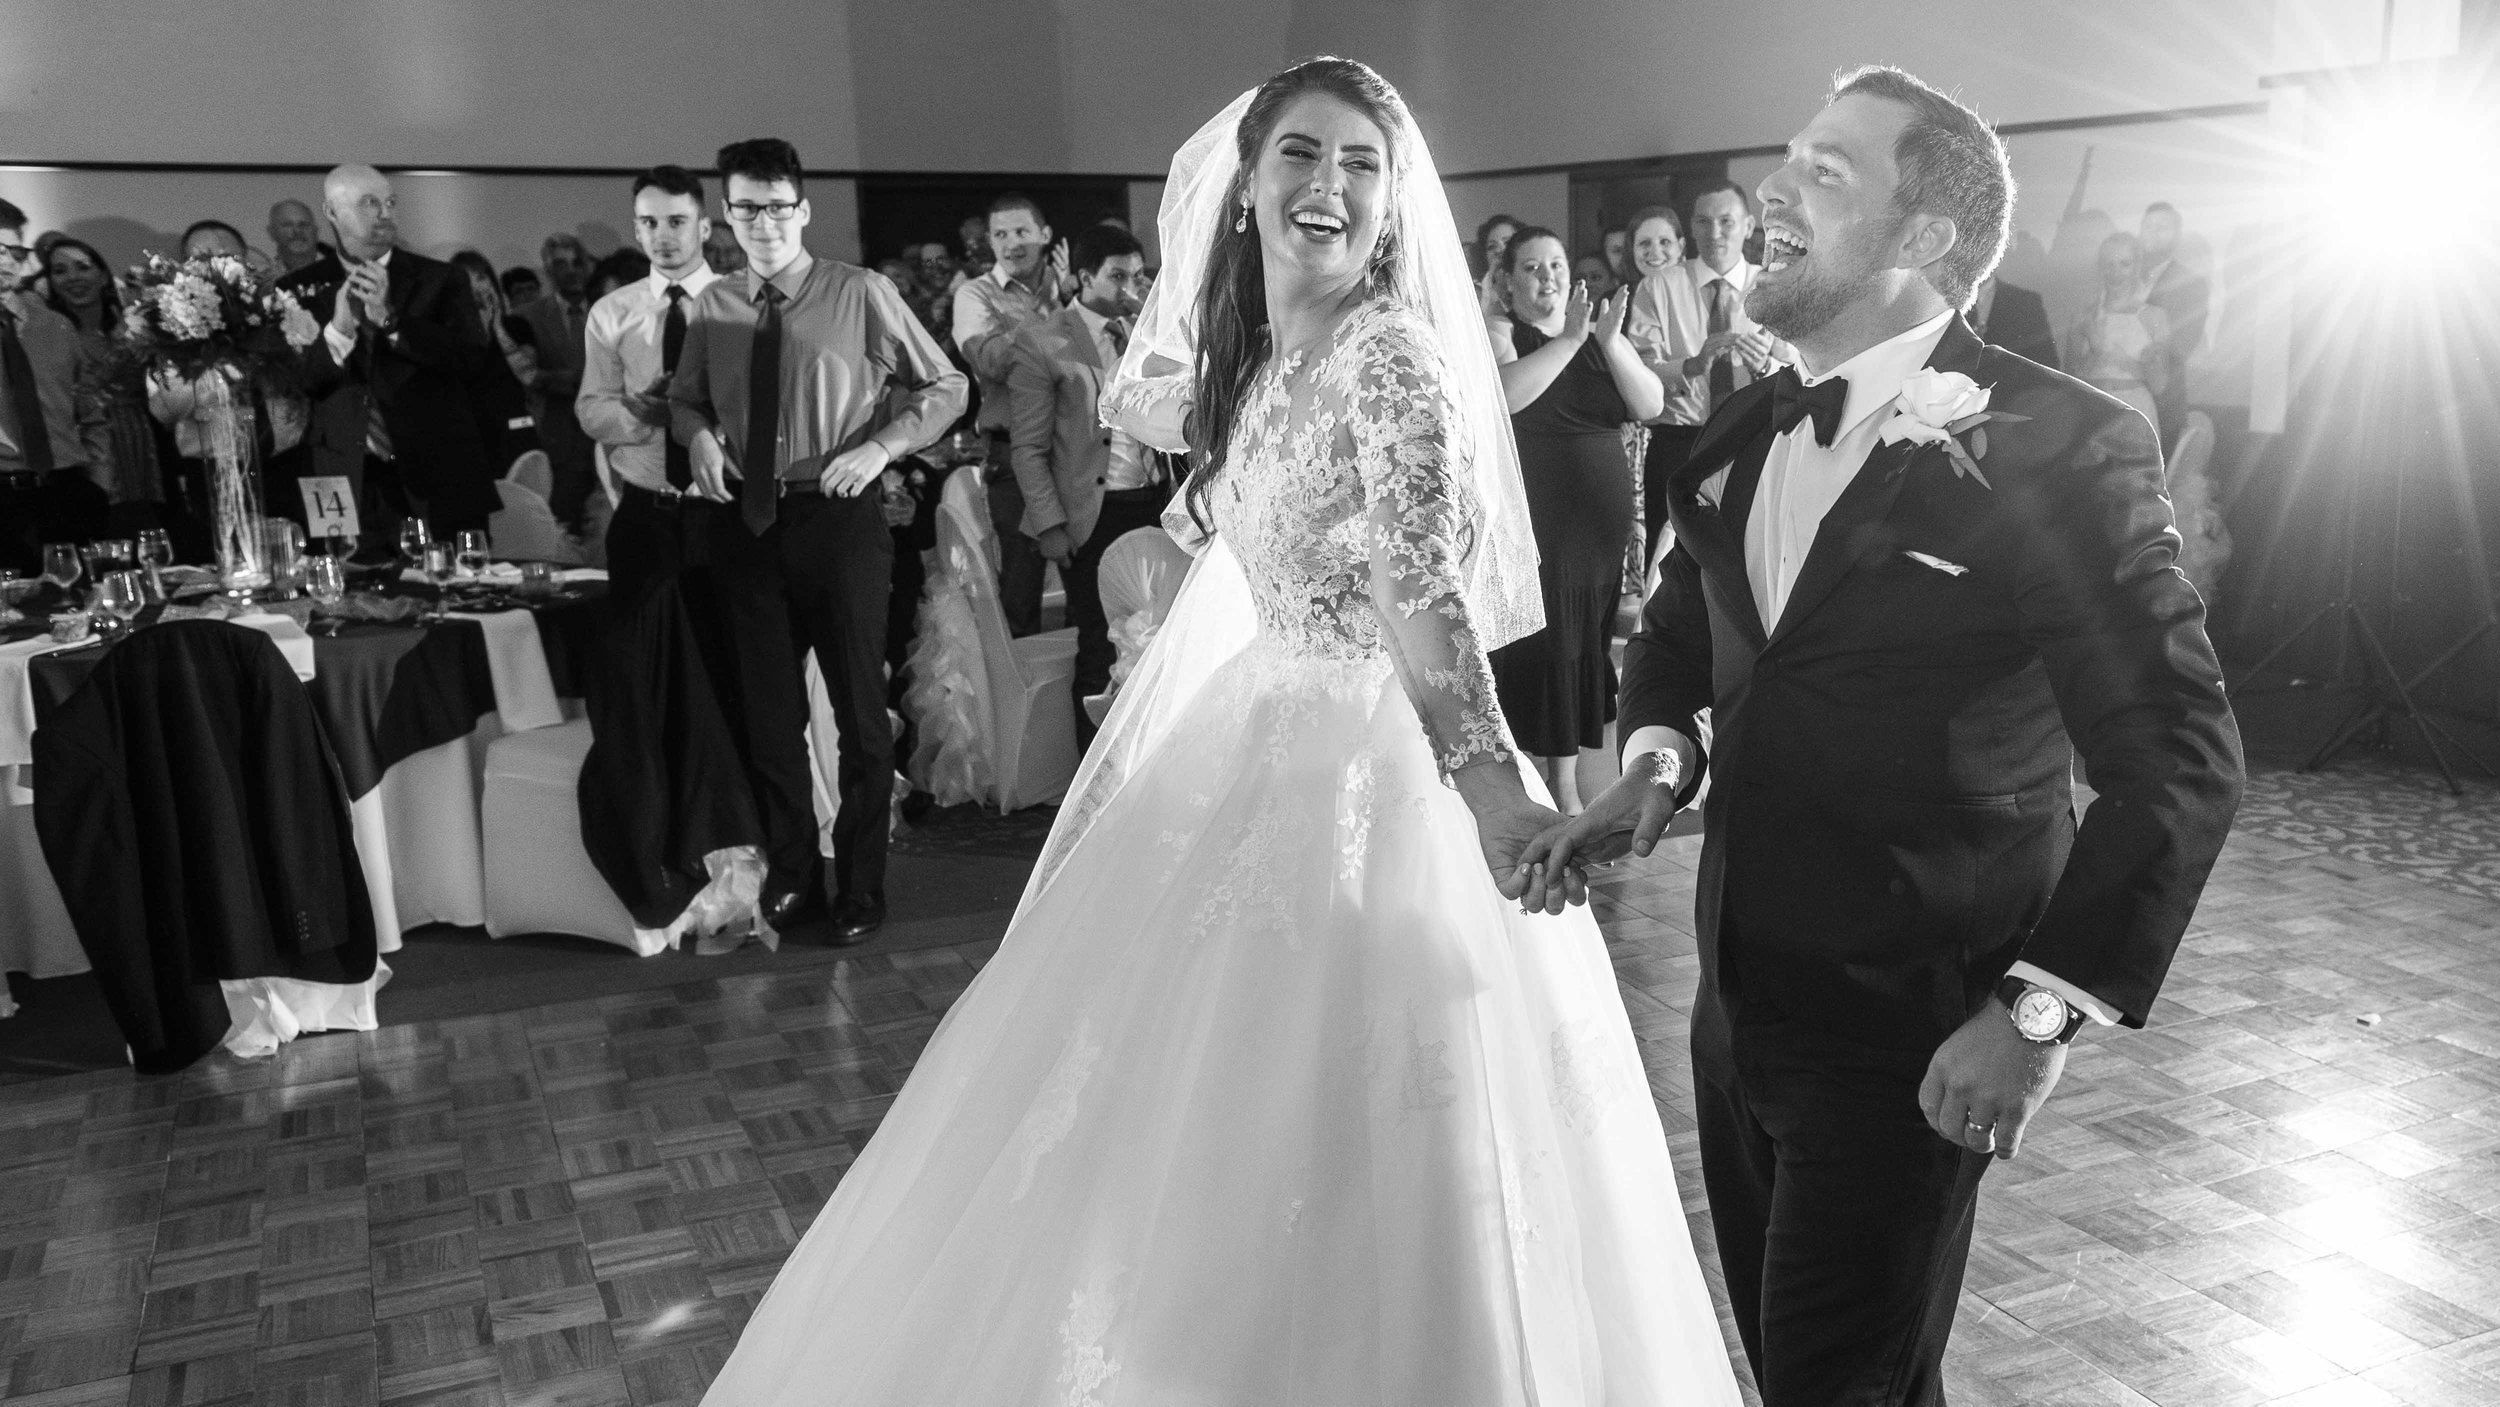 Wedding-Reception-Holy-Trinity-Center-4.jpg